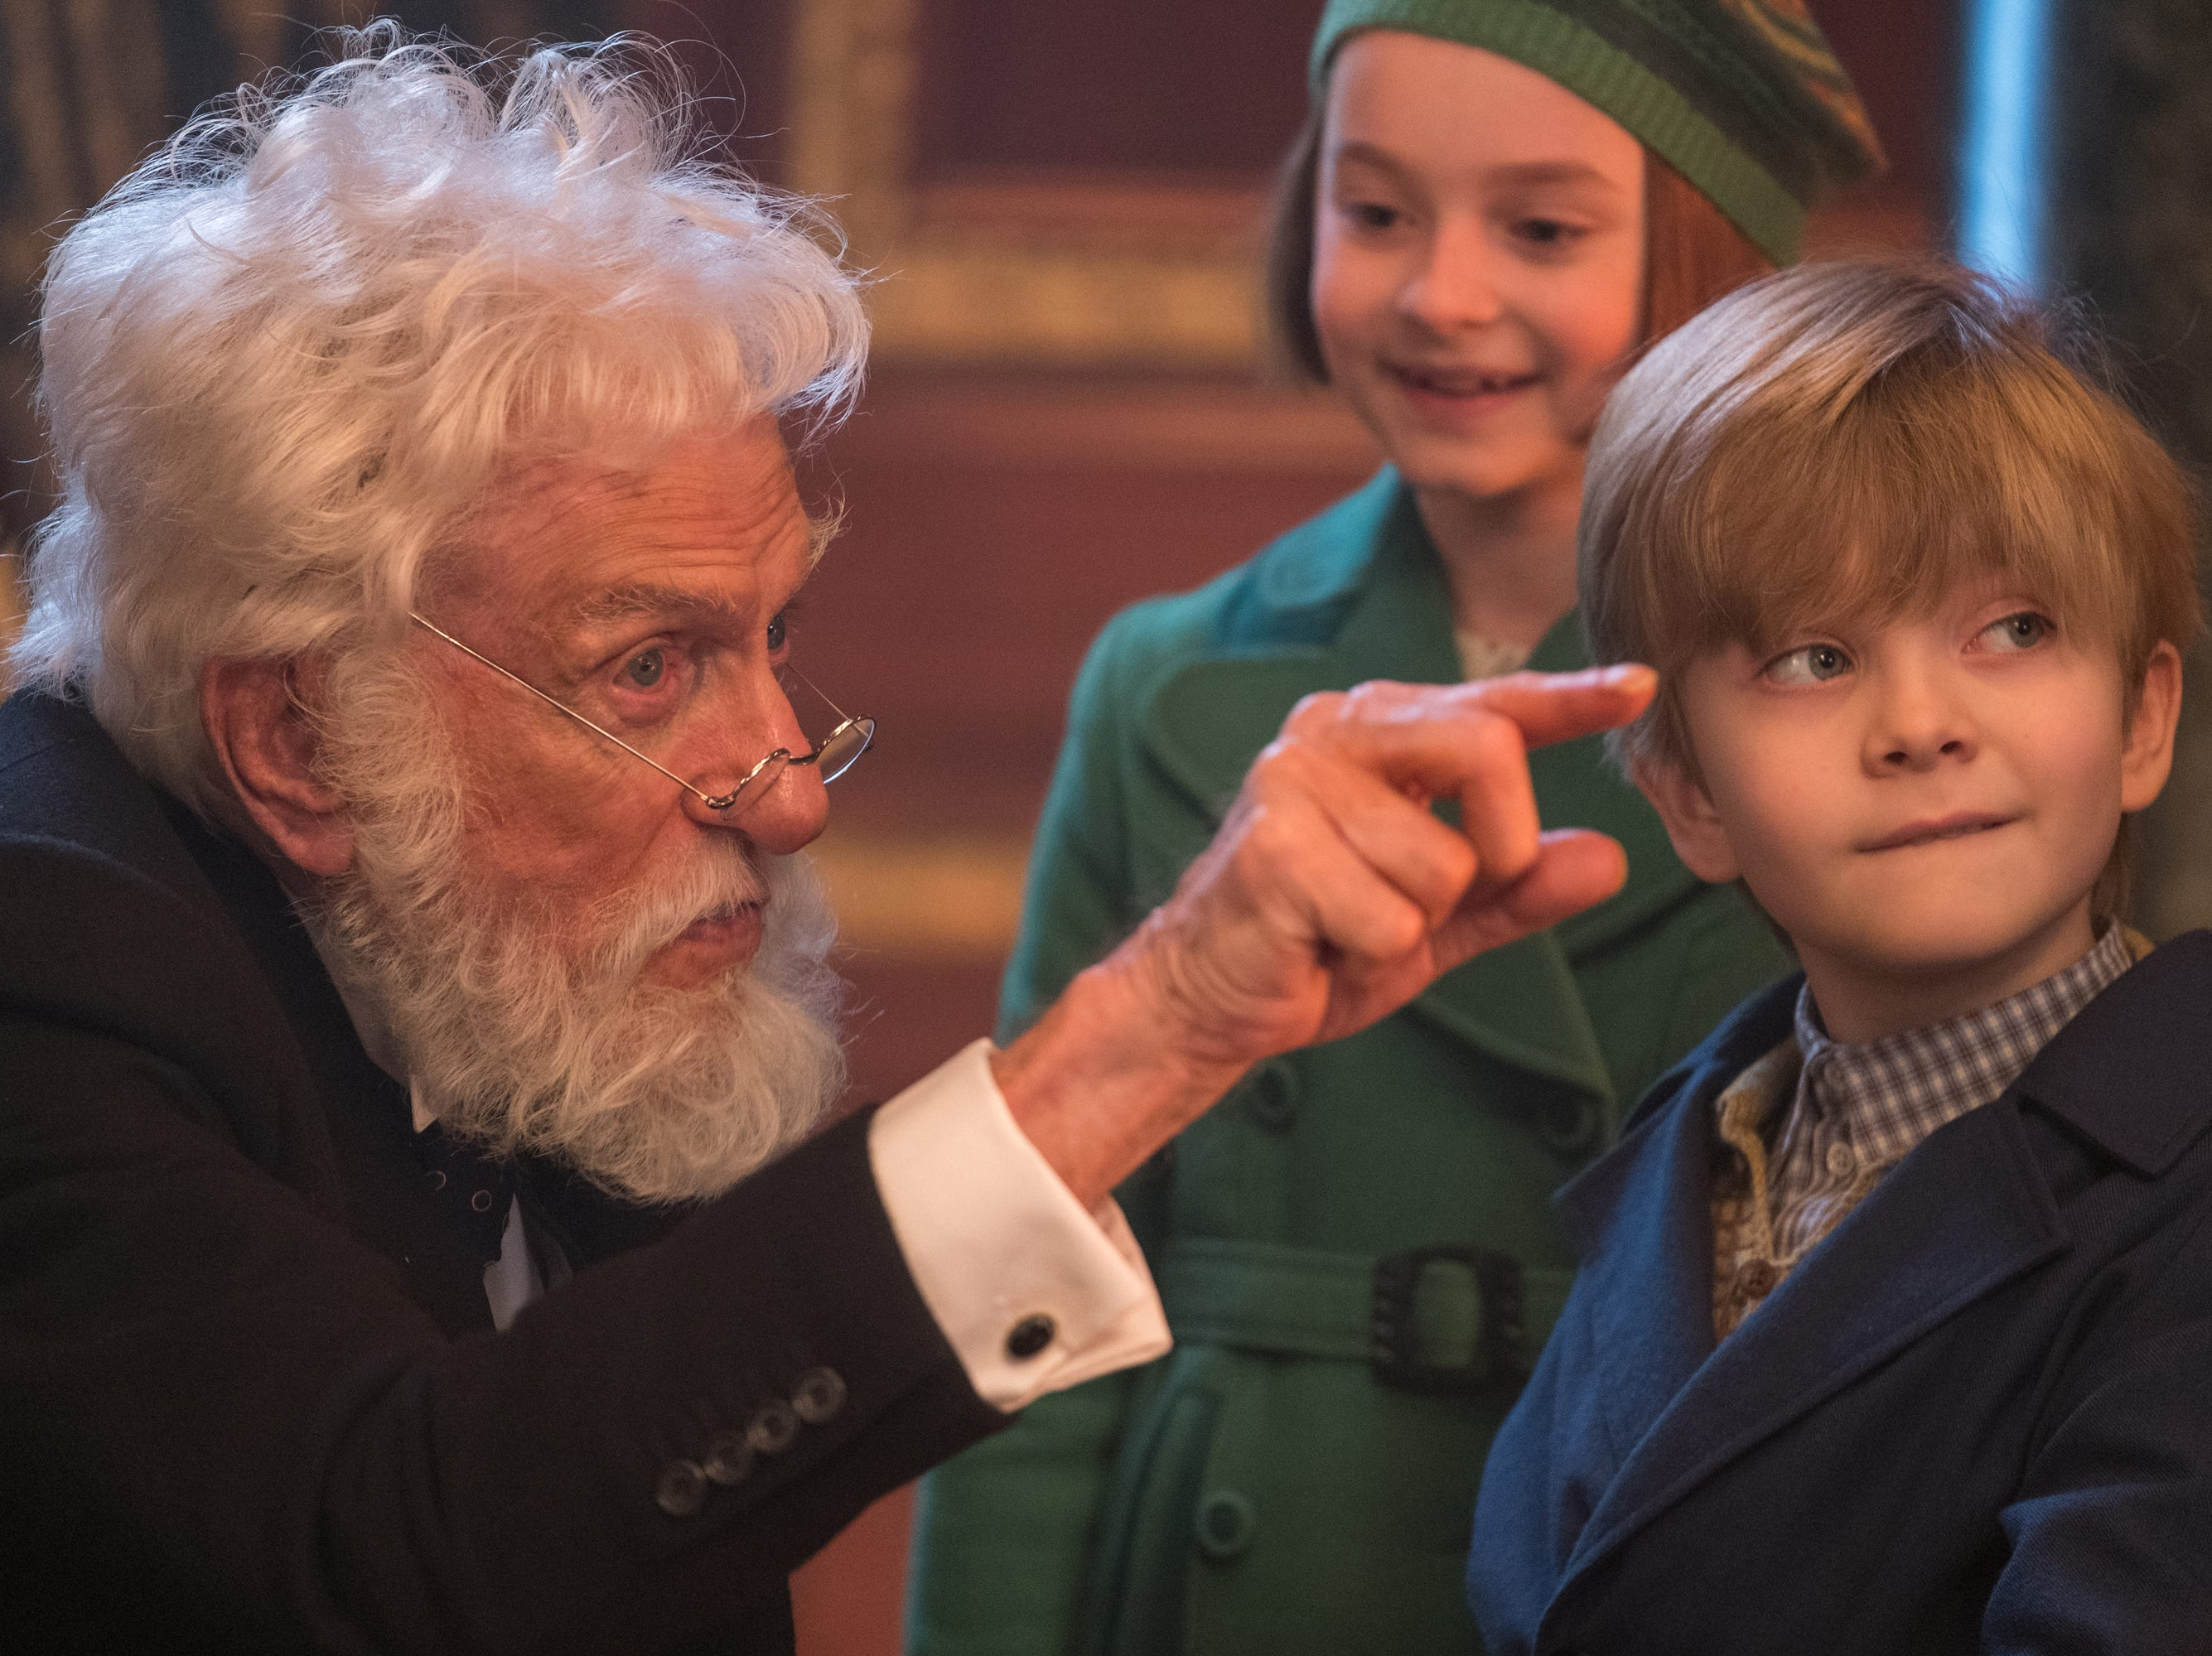 Dick Van Dyke is Mr. Dawes Jr., giving a lesson to the Banks children, Annabel  (Pixie Davies) and Georgie (Joel Dawson).